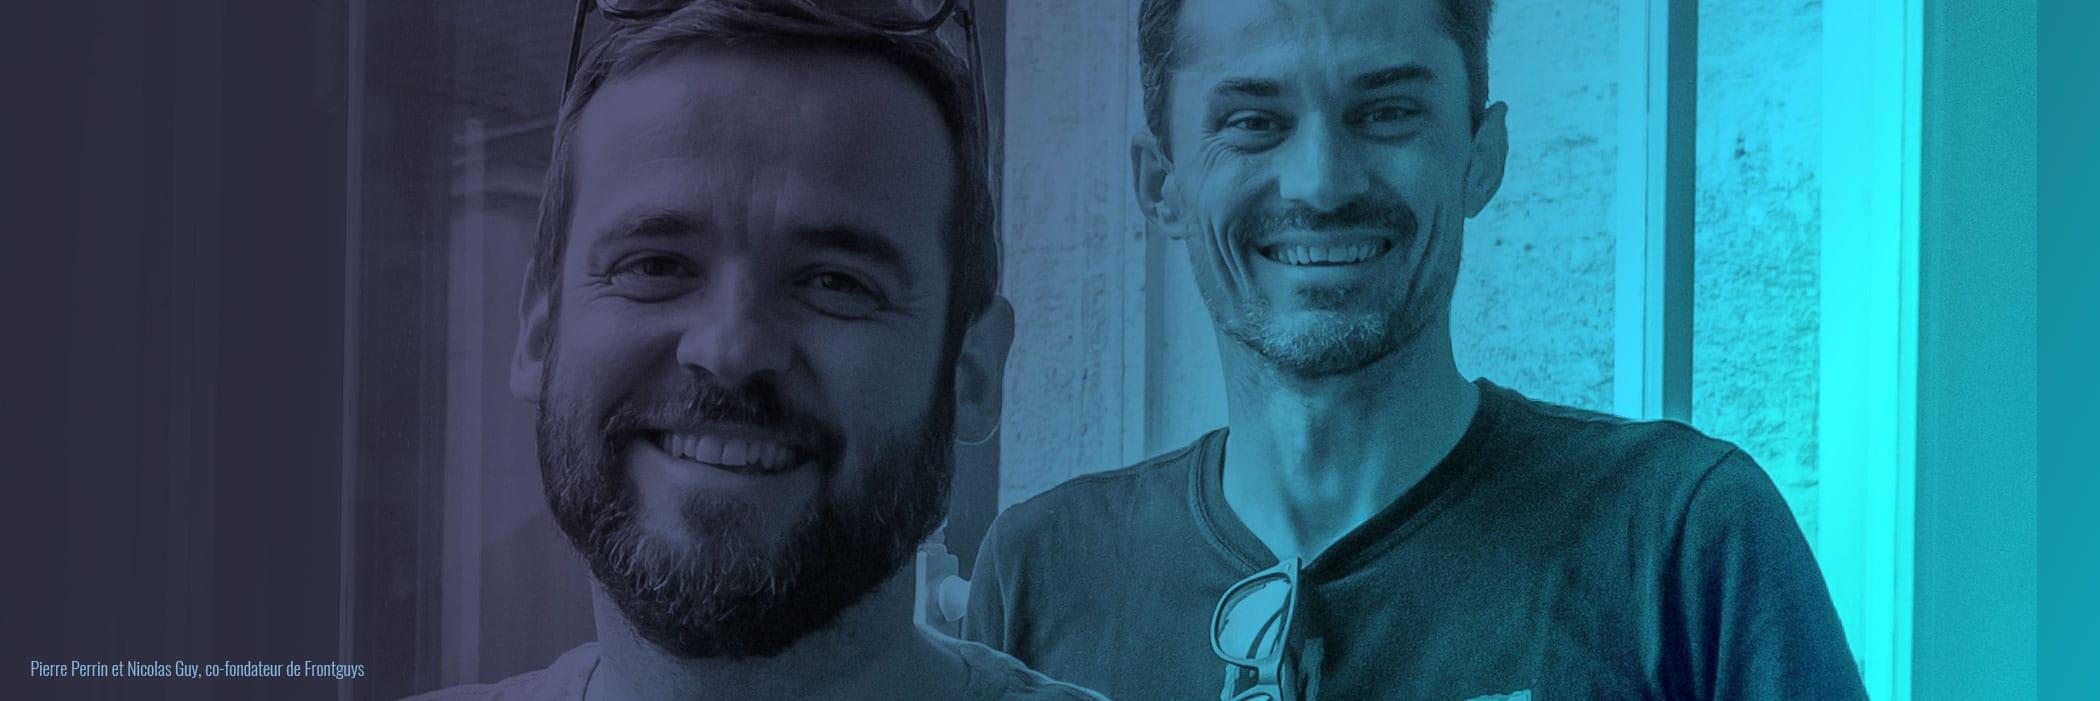 Pierre Perrin et Nicolas Guy, co-fondateur de Frontguys